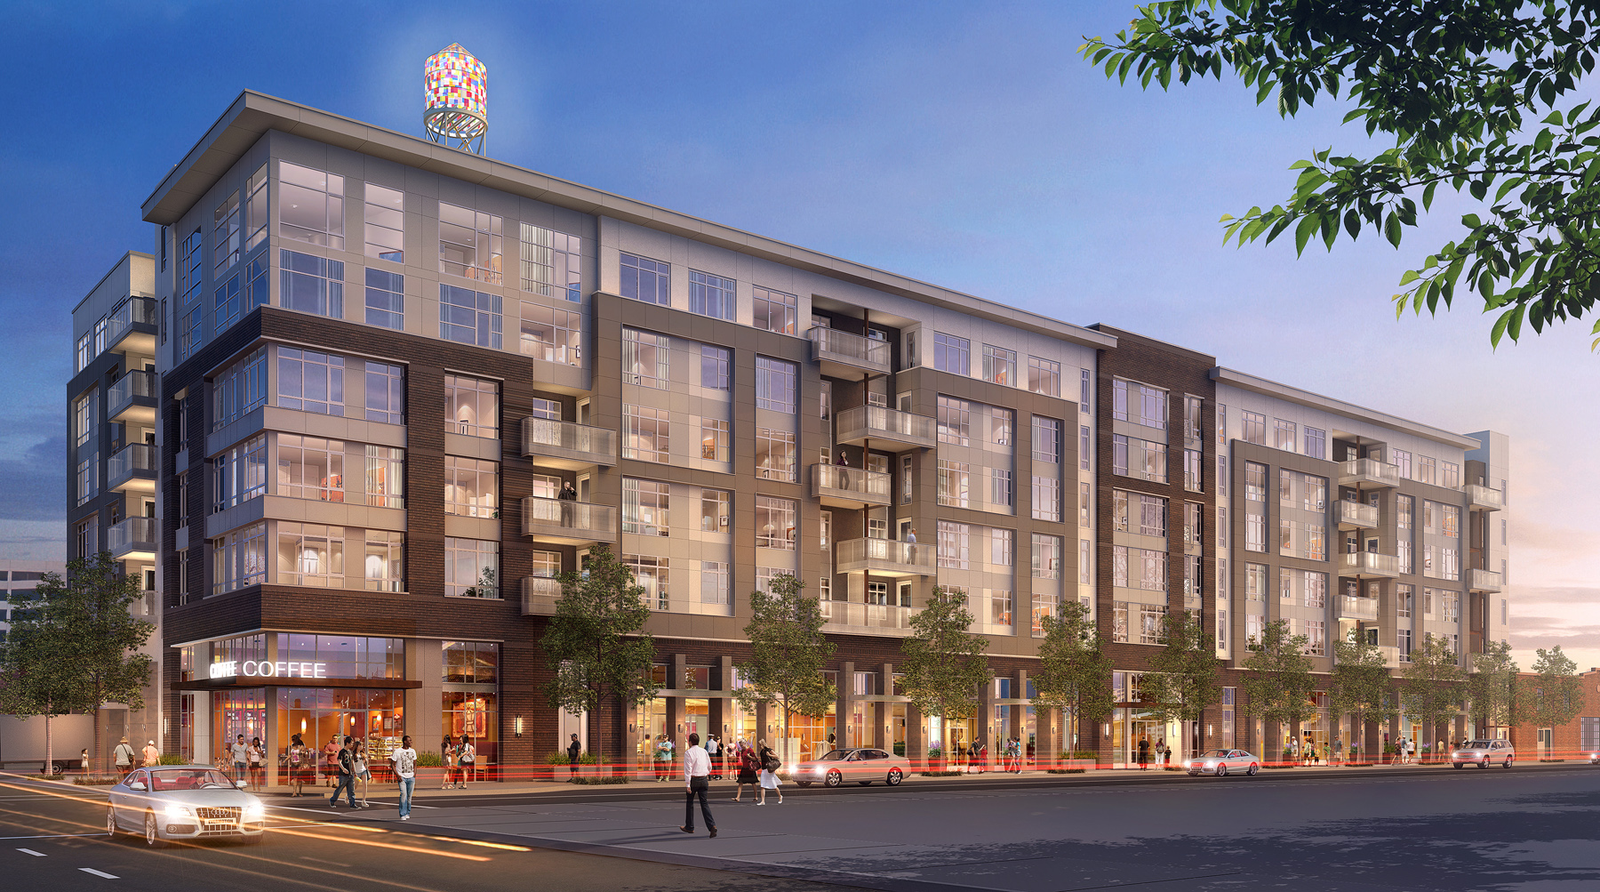 bdmag new u s home builder news ktgy design transforms city parking lot into 135 million mixed use destination in lake merritt